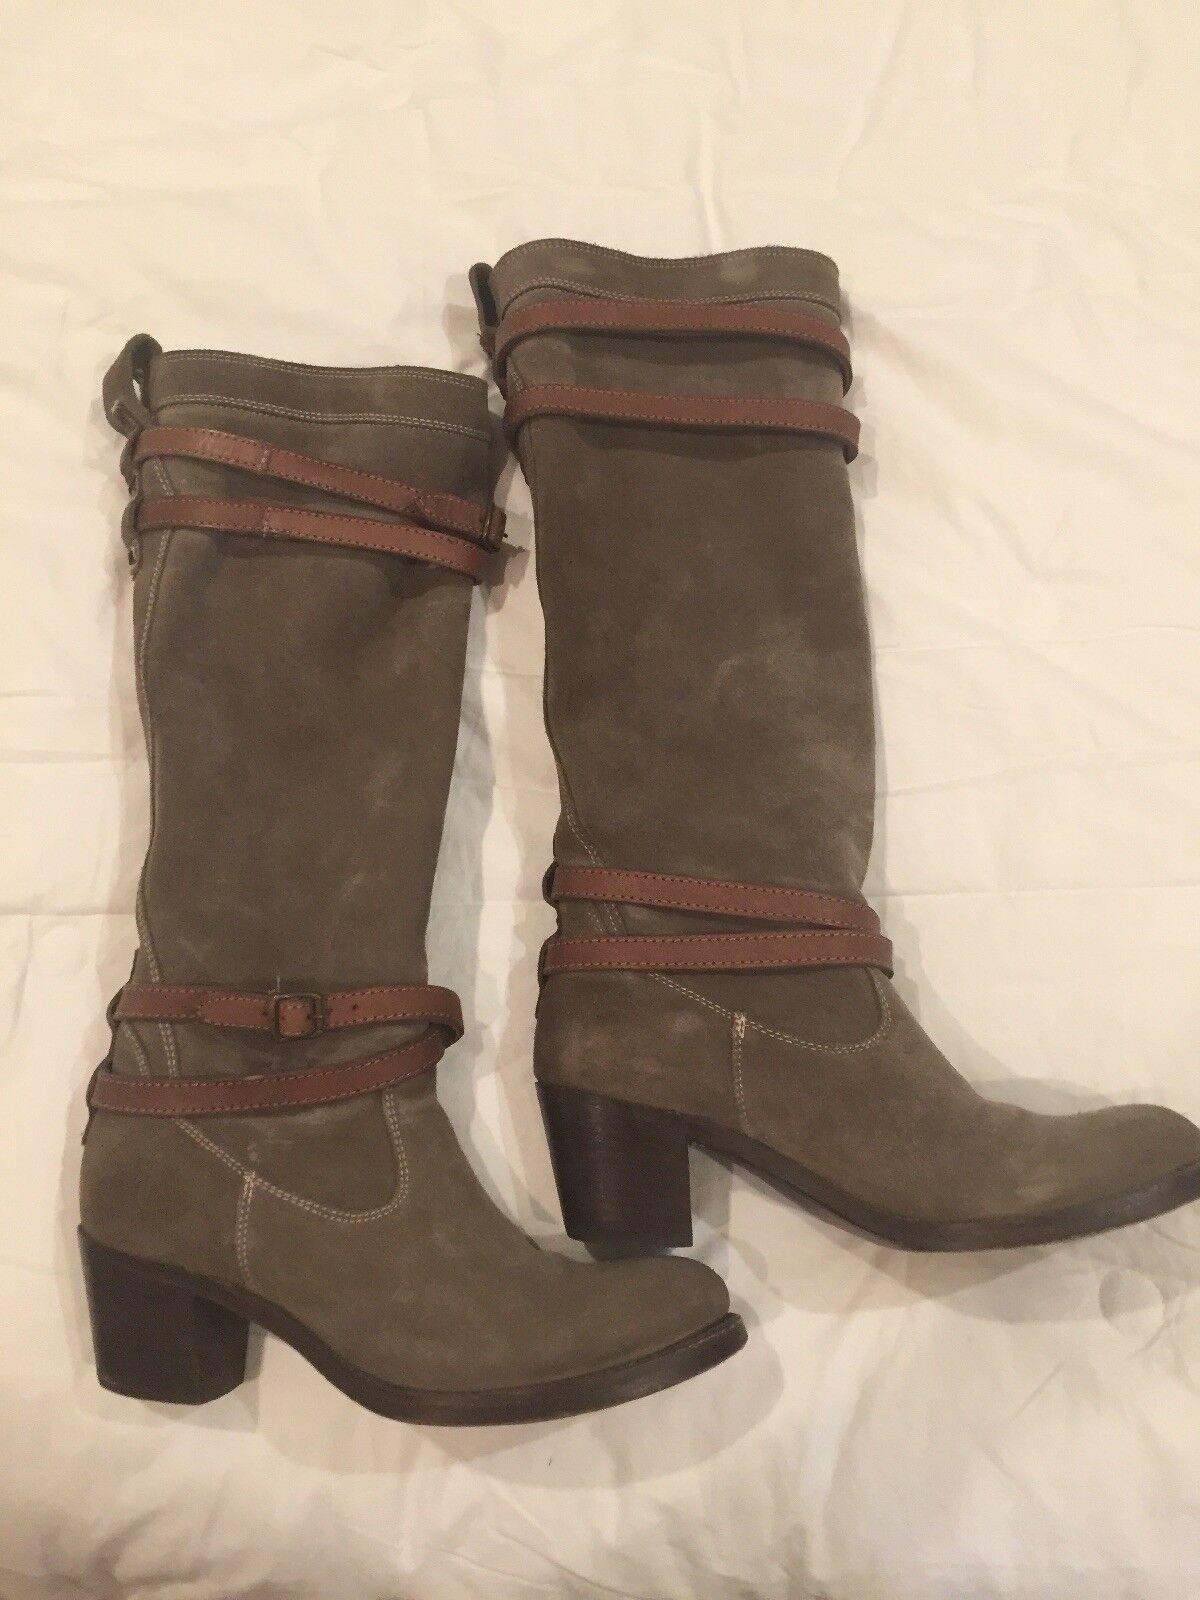 Frye Jane Strappy Tall Knee Boot 8.5 Olive Khaki VGUC